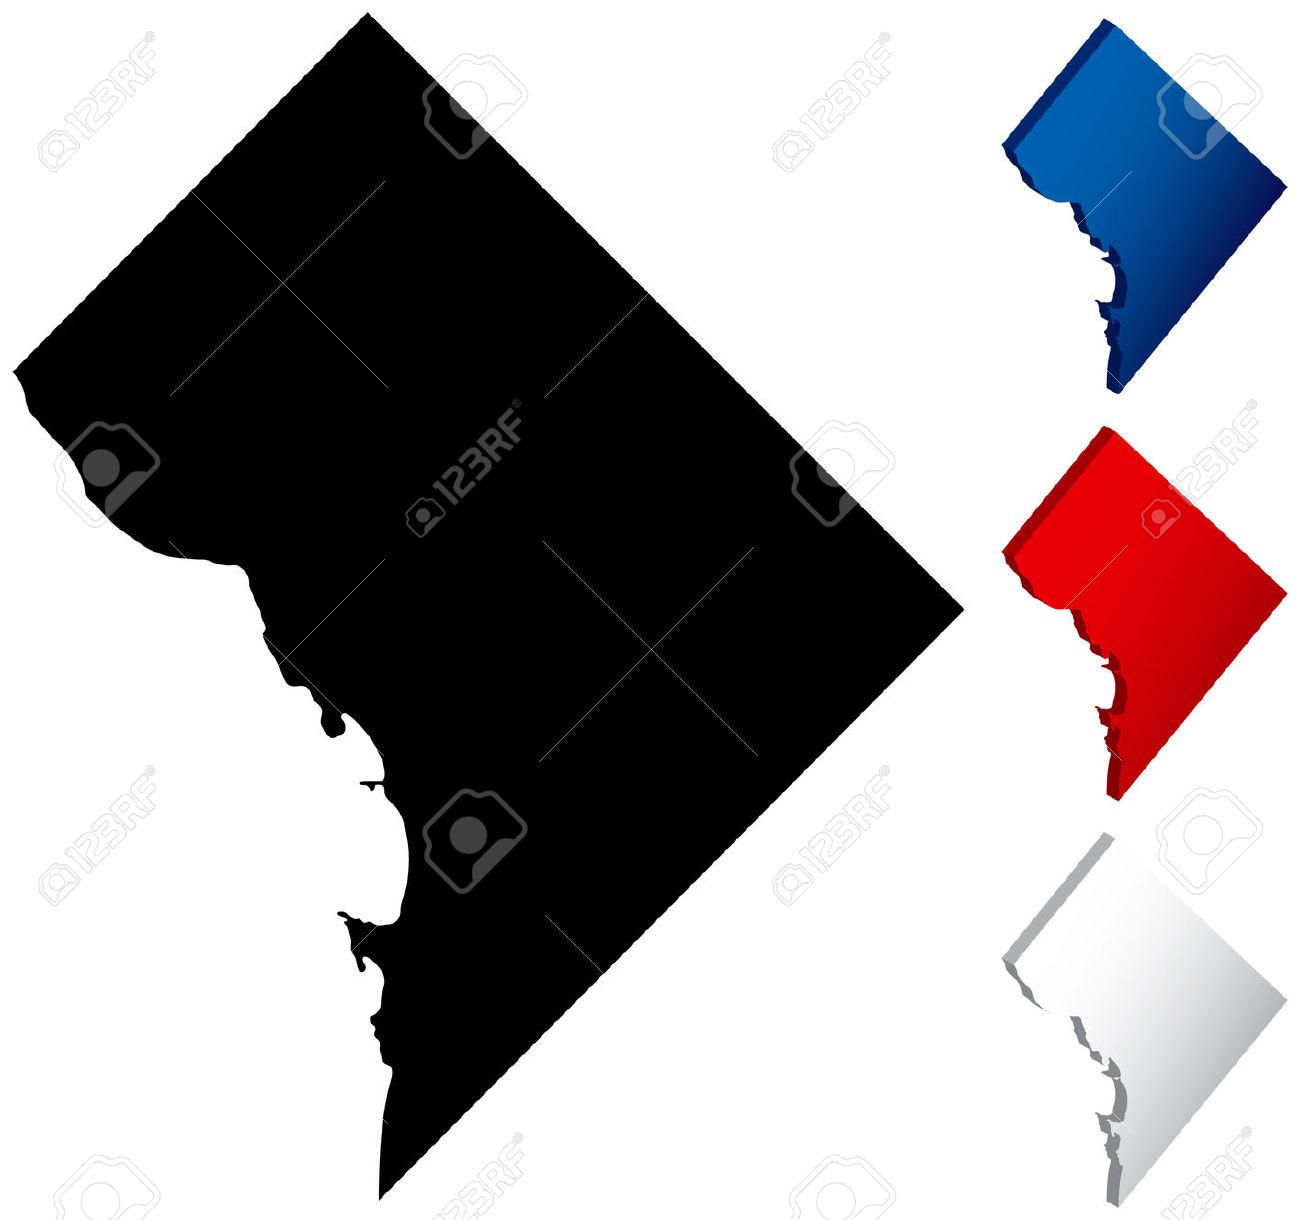 Washington dc map clipart.